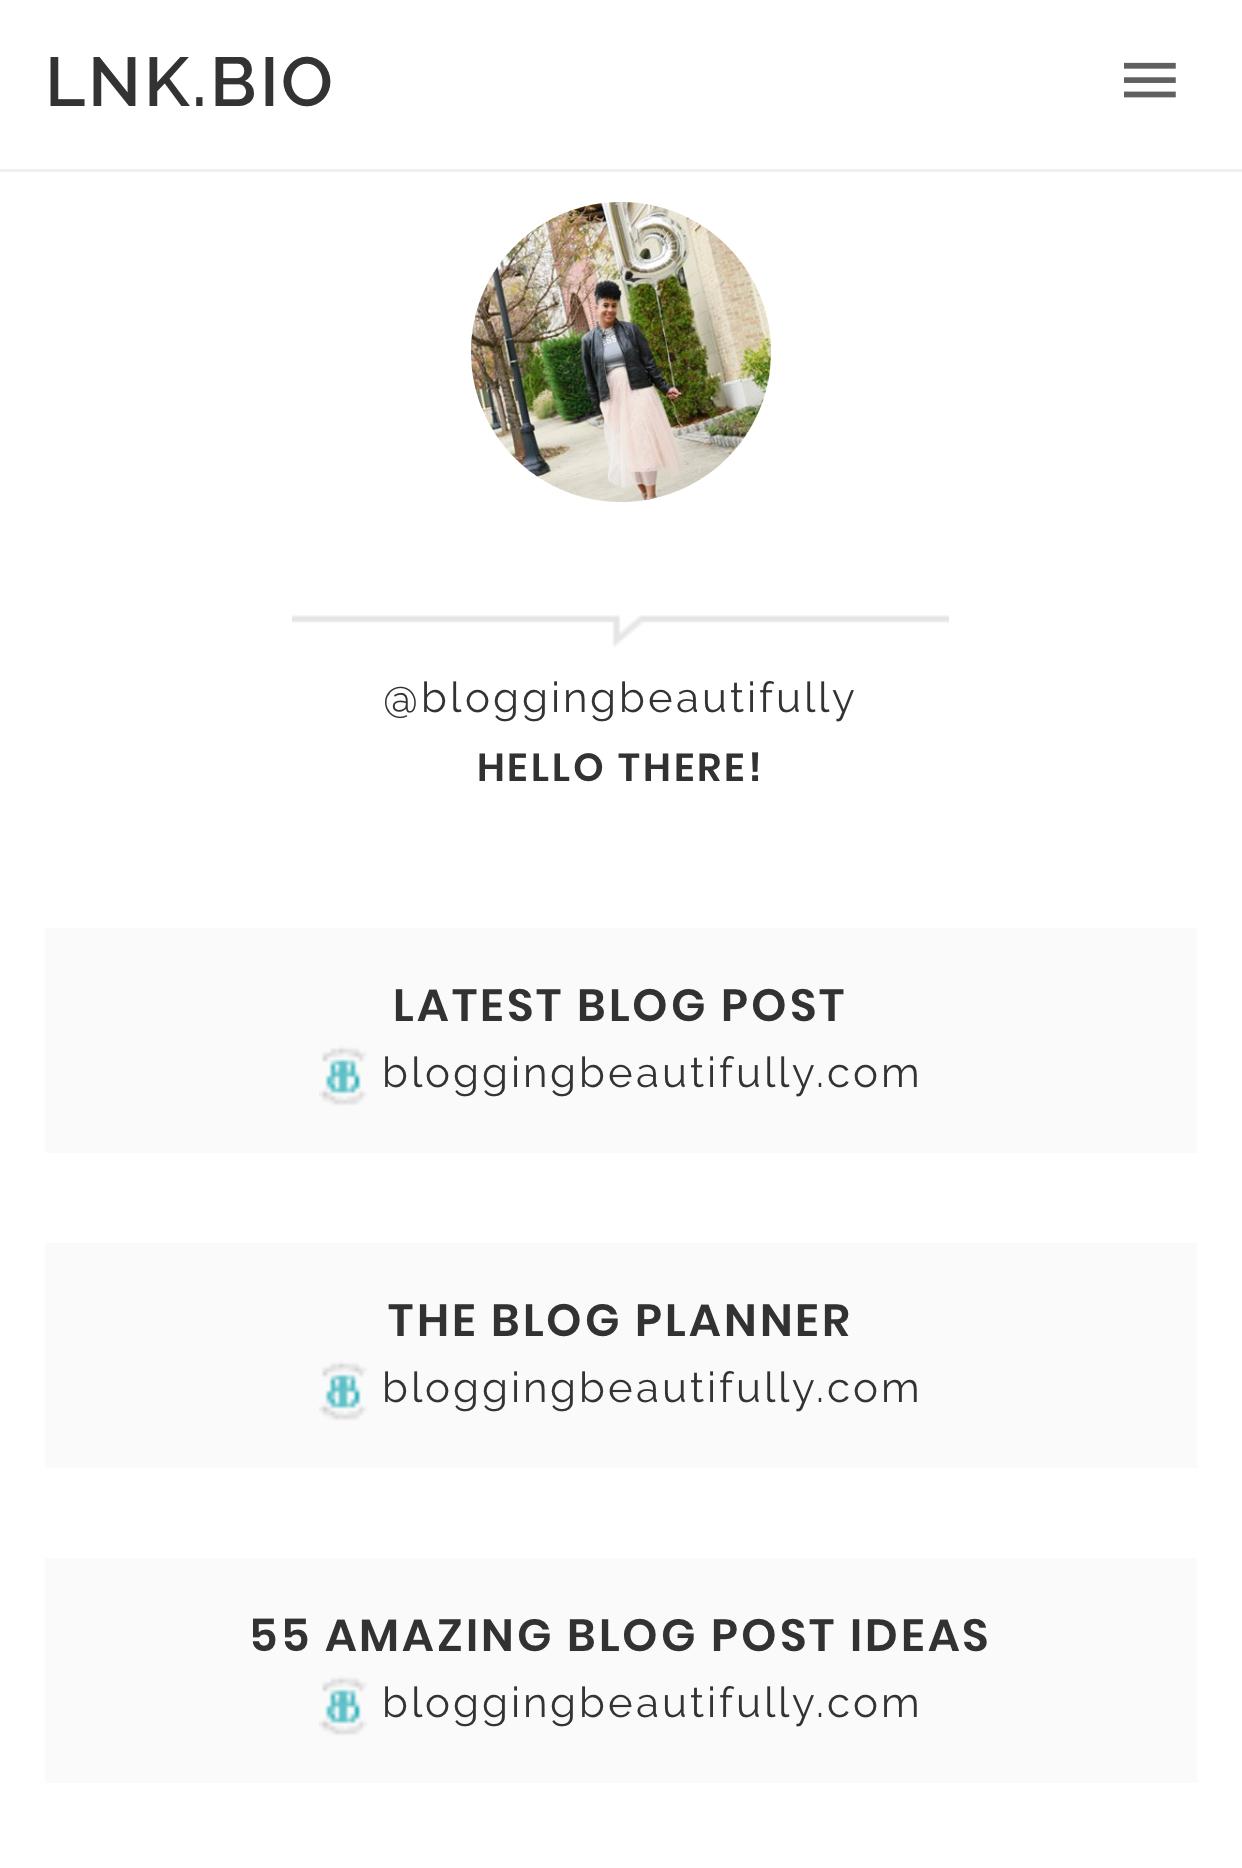 https://lnk.bio/BloggingBeautifully